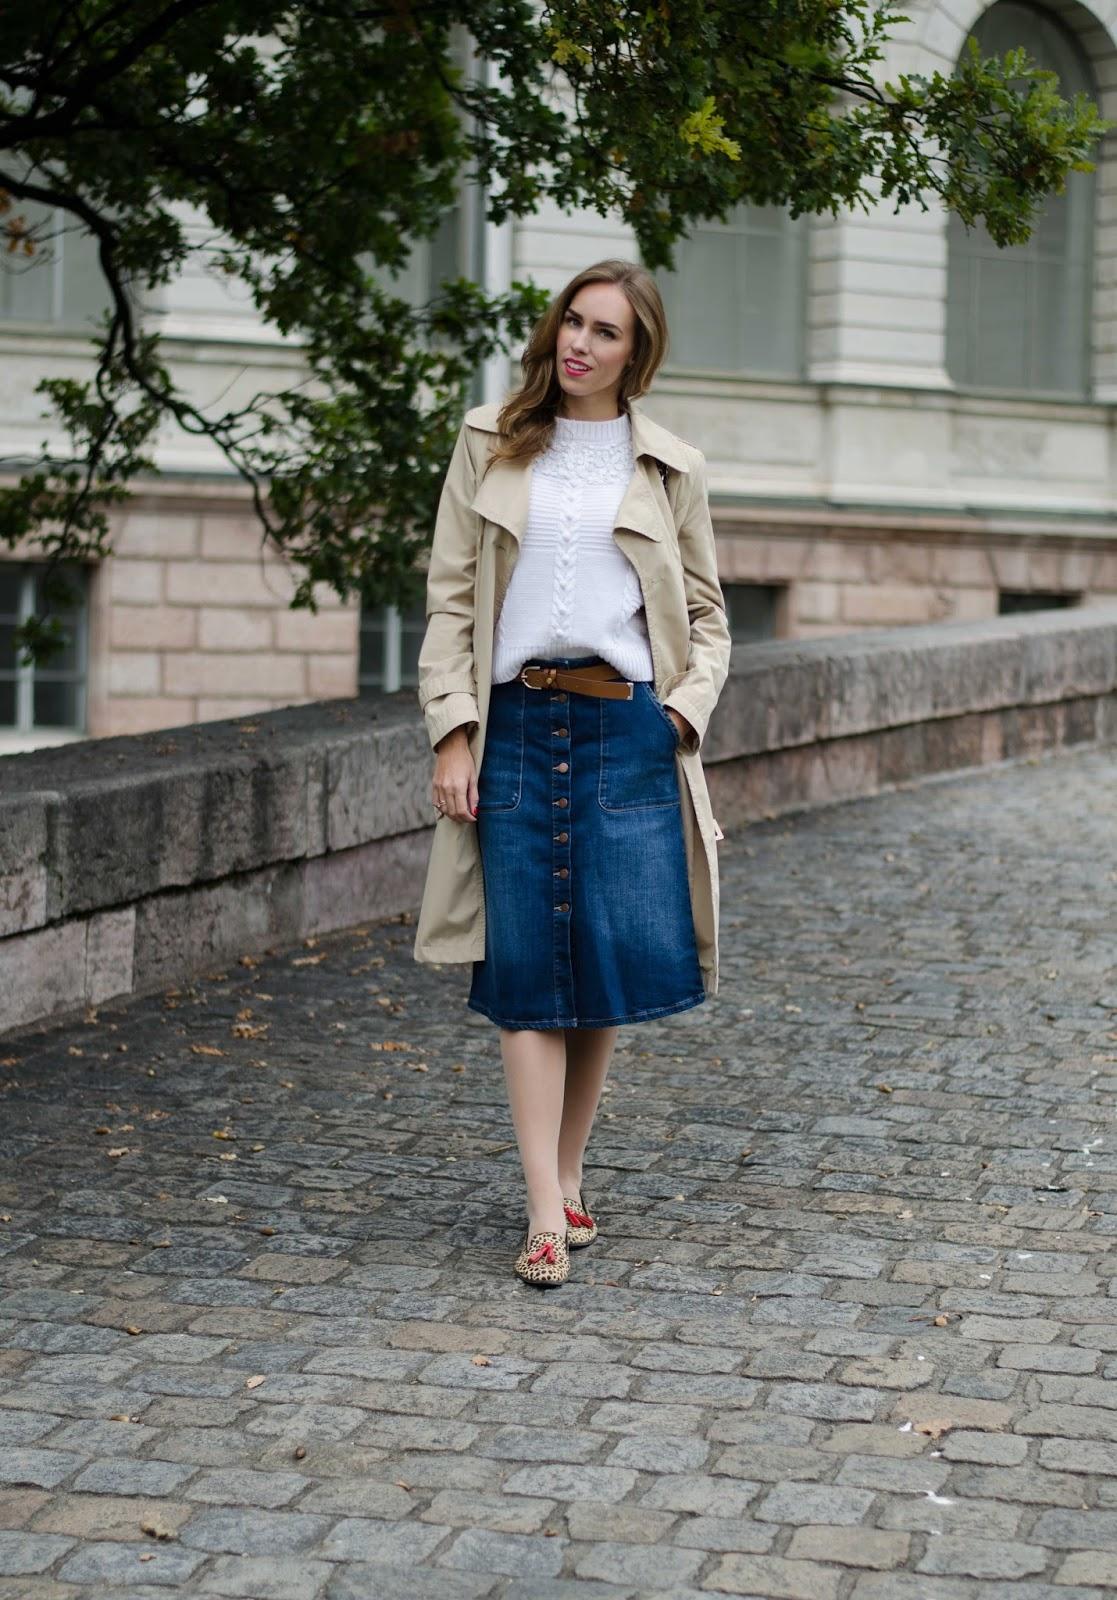 kristjaana mere trench coat white jumper denim button front midi skirt fall outfit